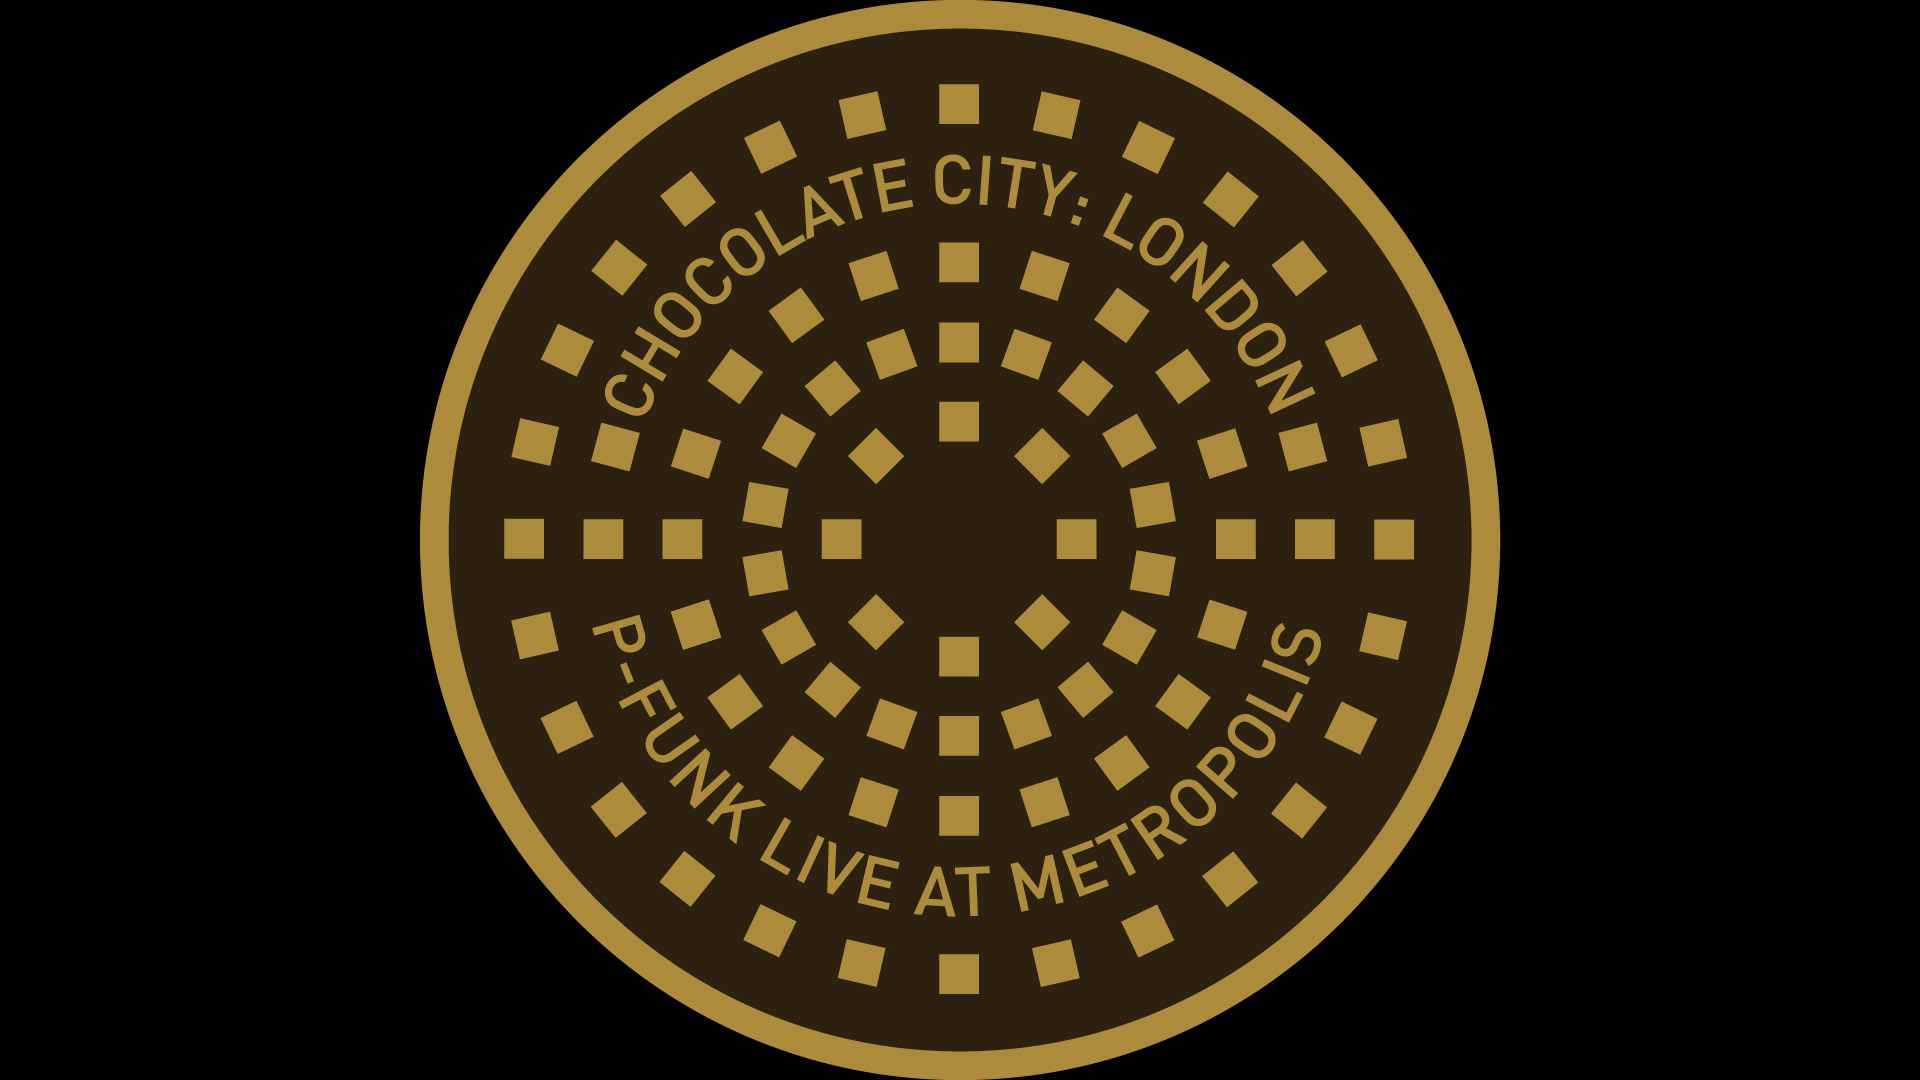 George Clinton Chocolate City London Dvd Type40 Video